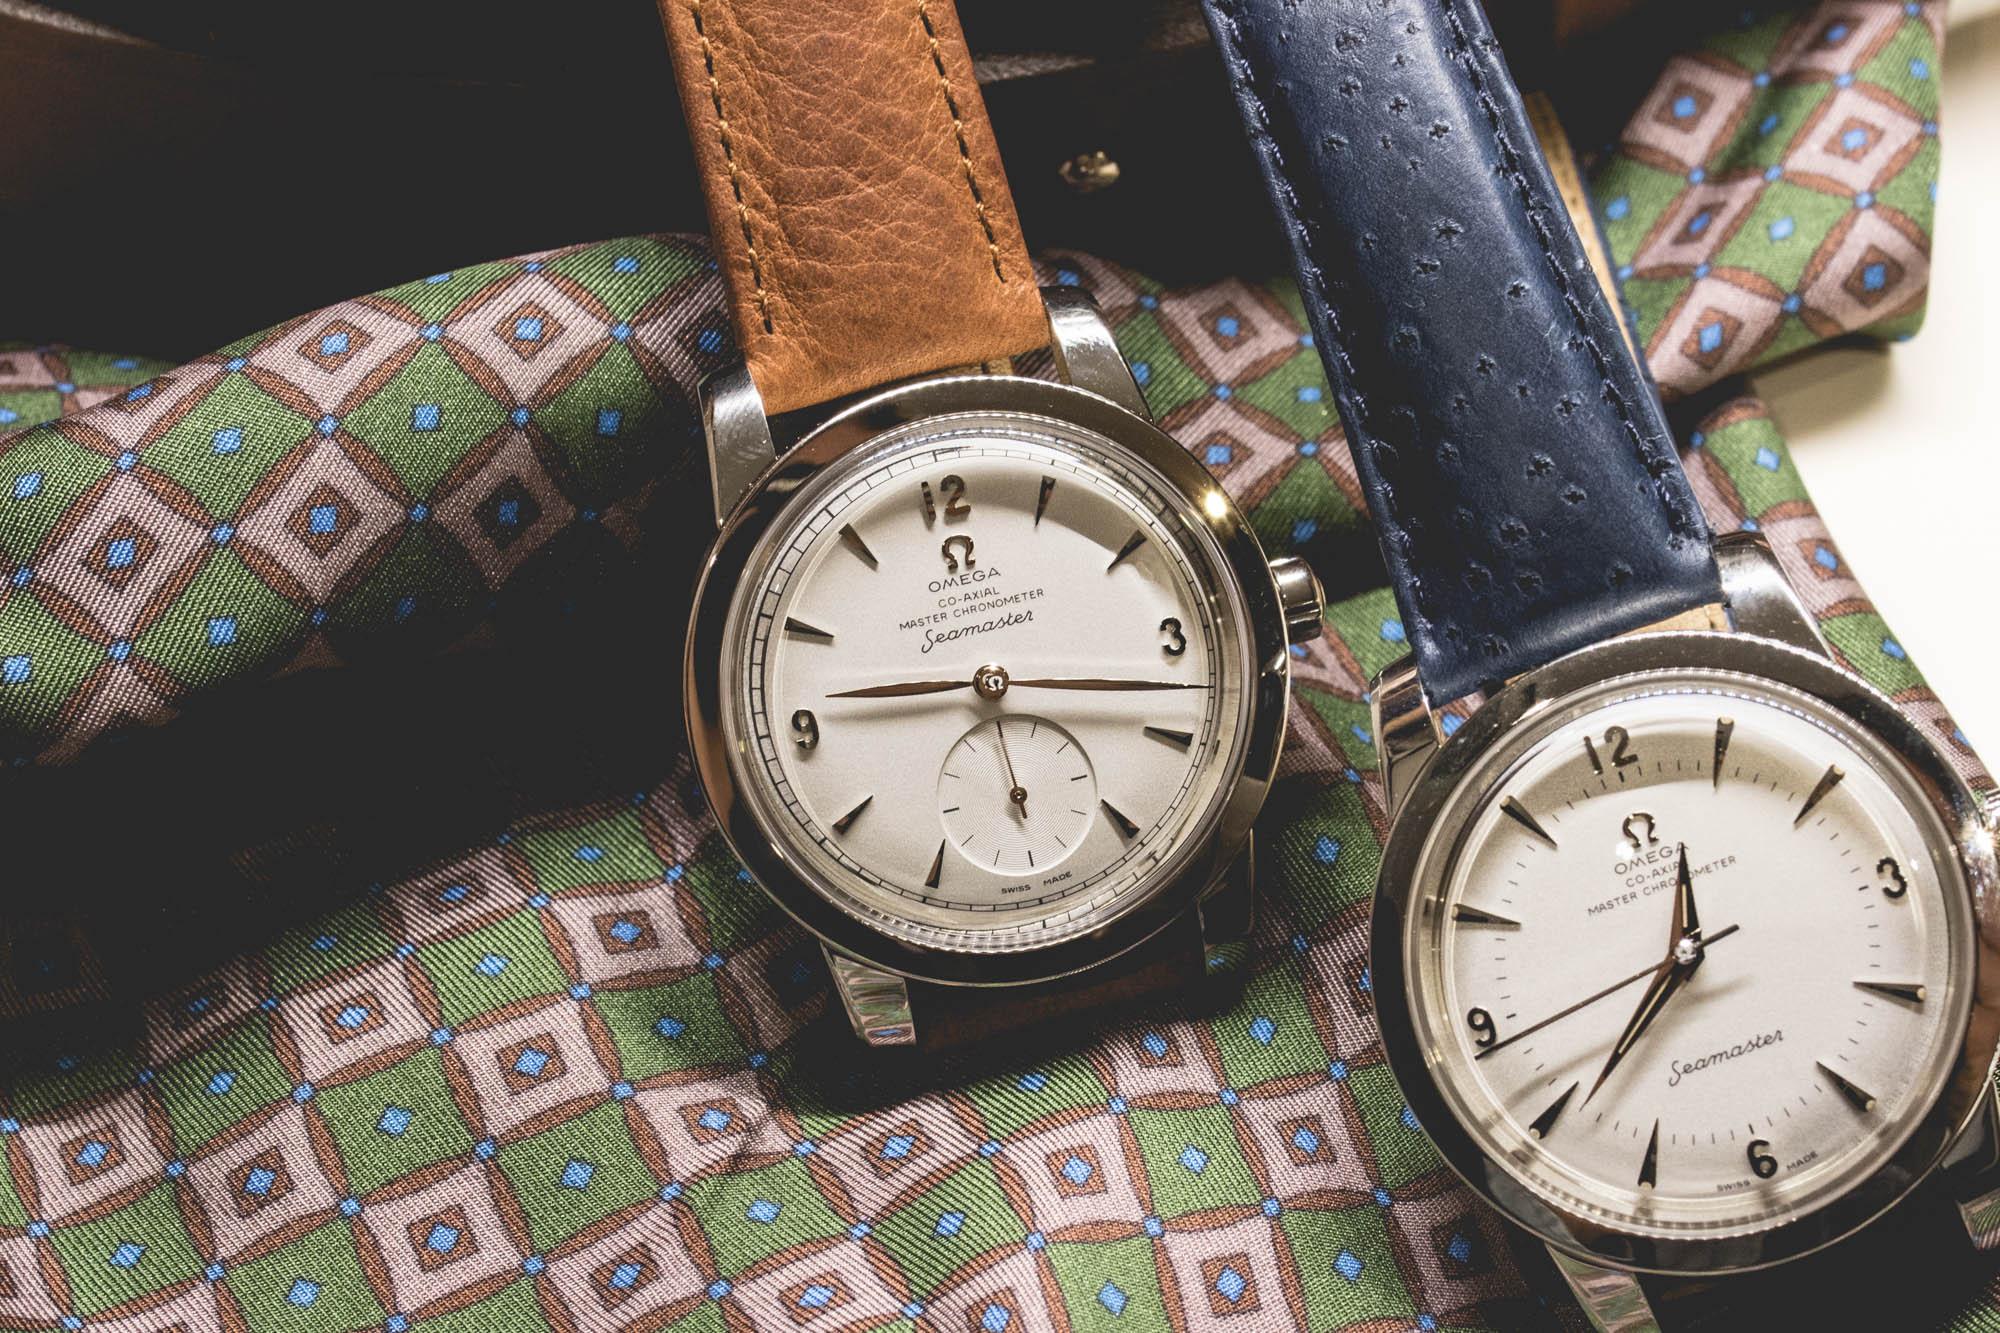 Baselworld 2018 - Omega Seamaster 70th anniversary